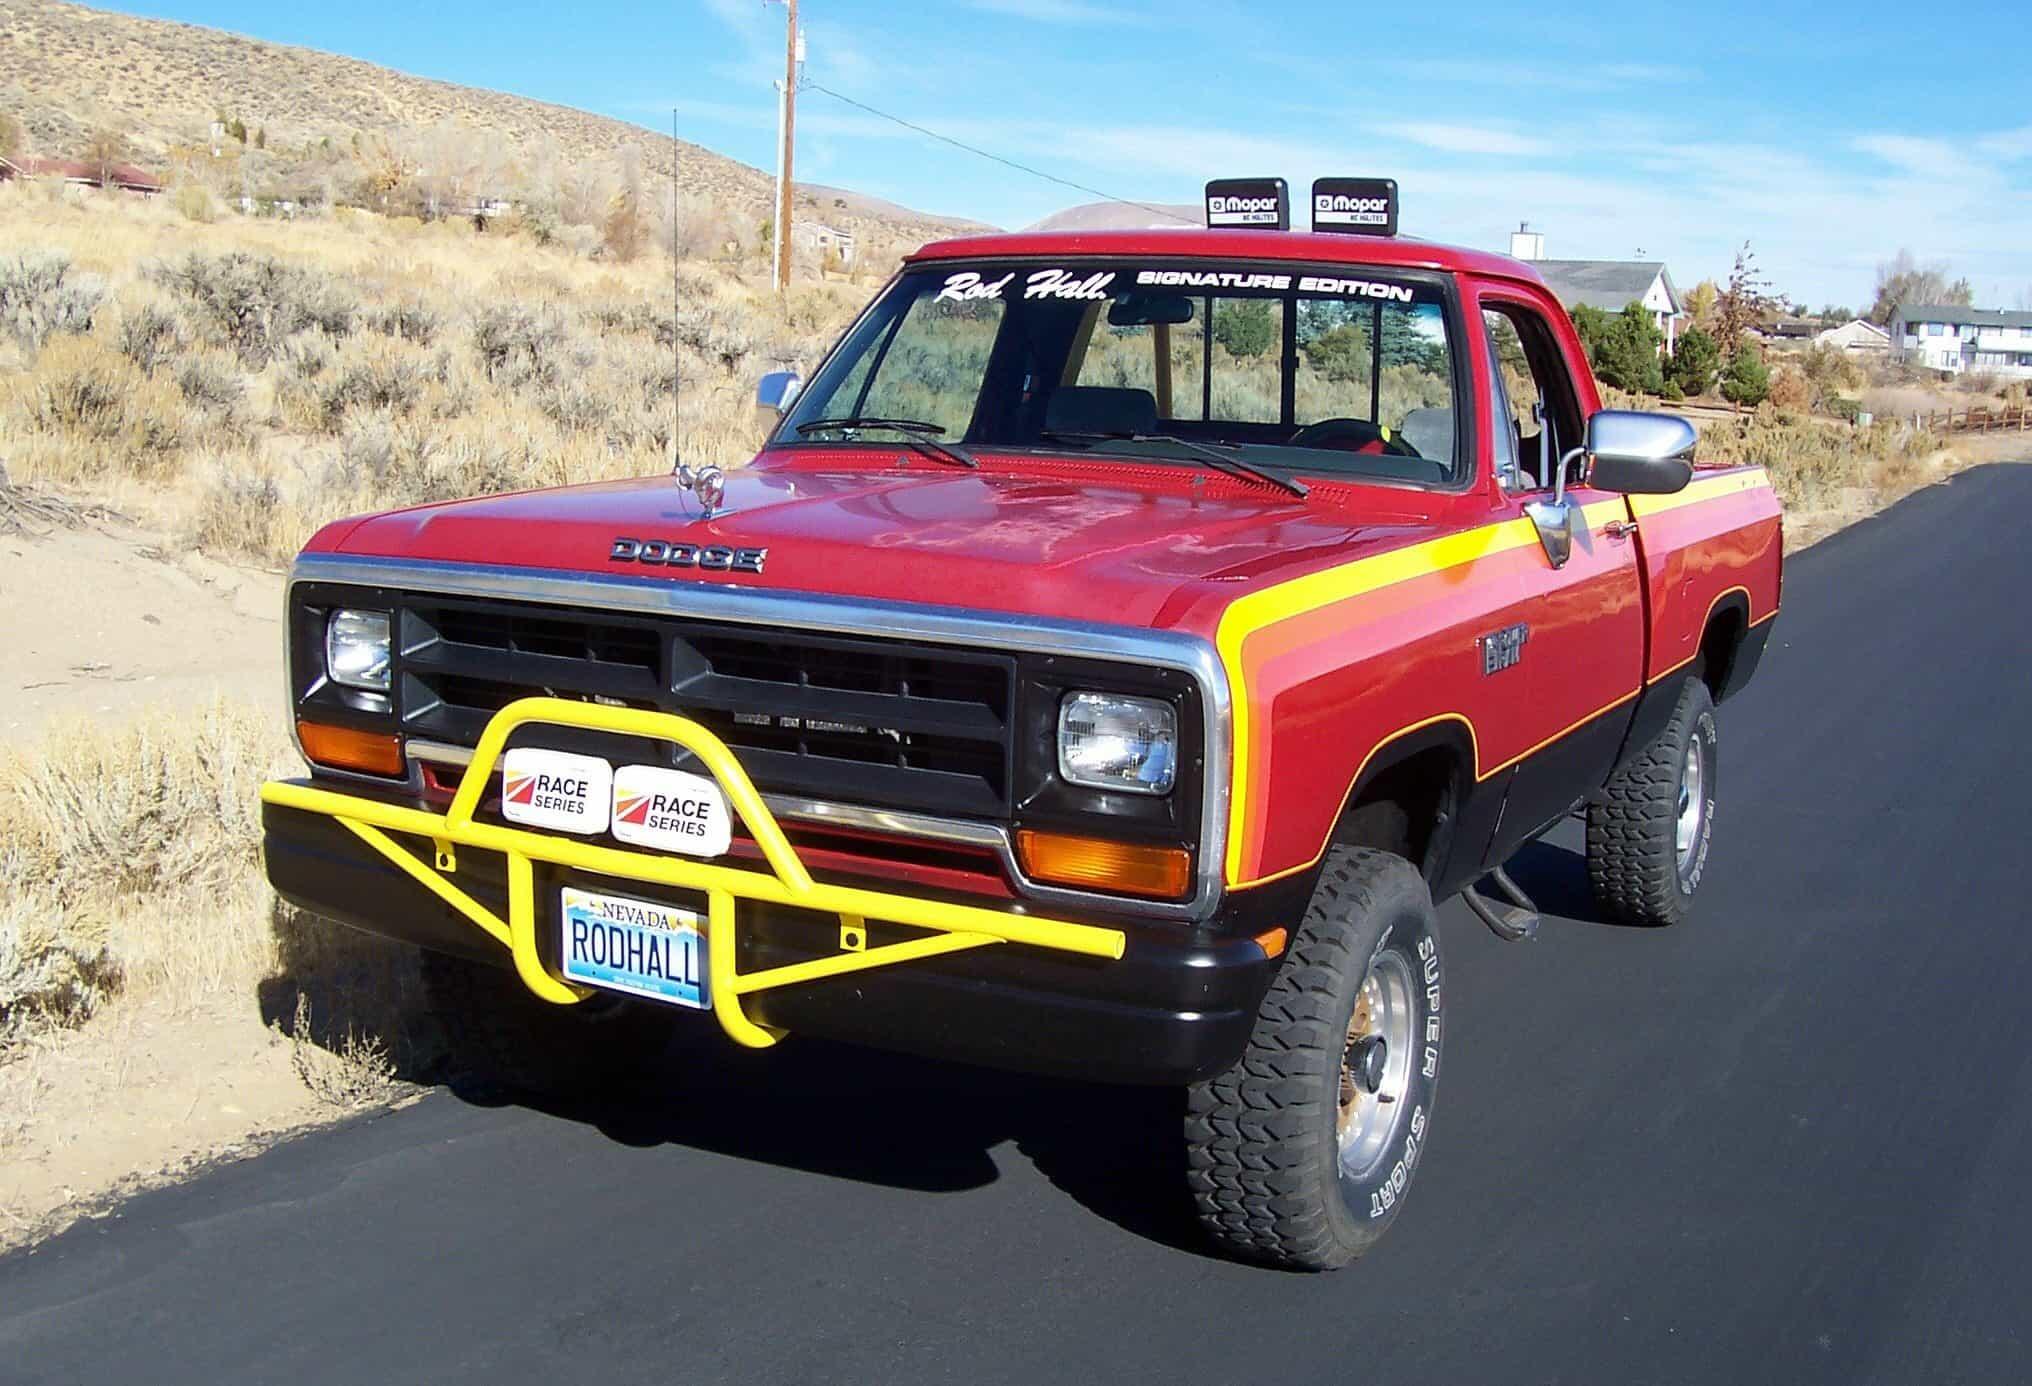 top ten pickup trucks - Dodge rod-hall